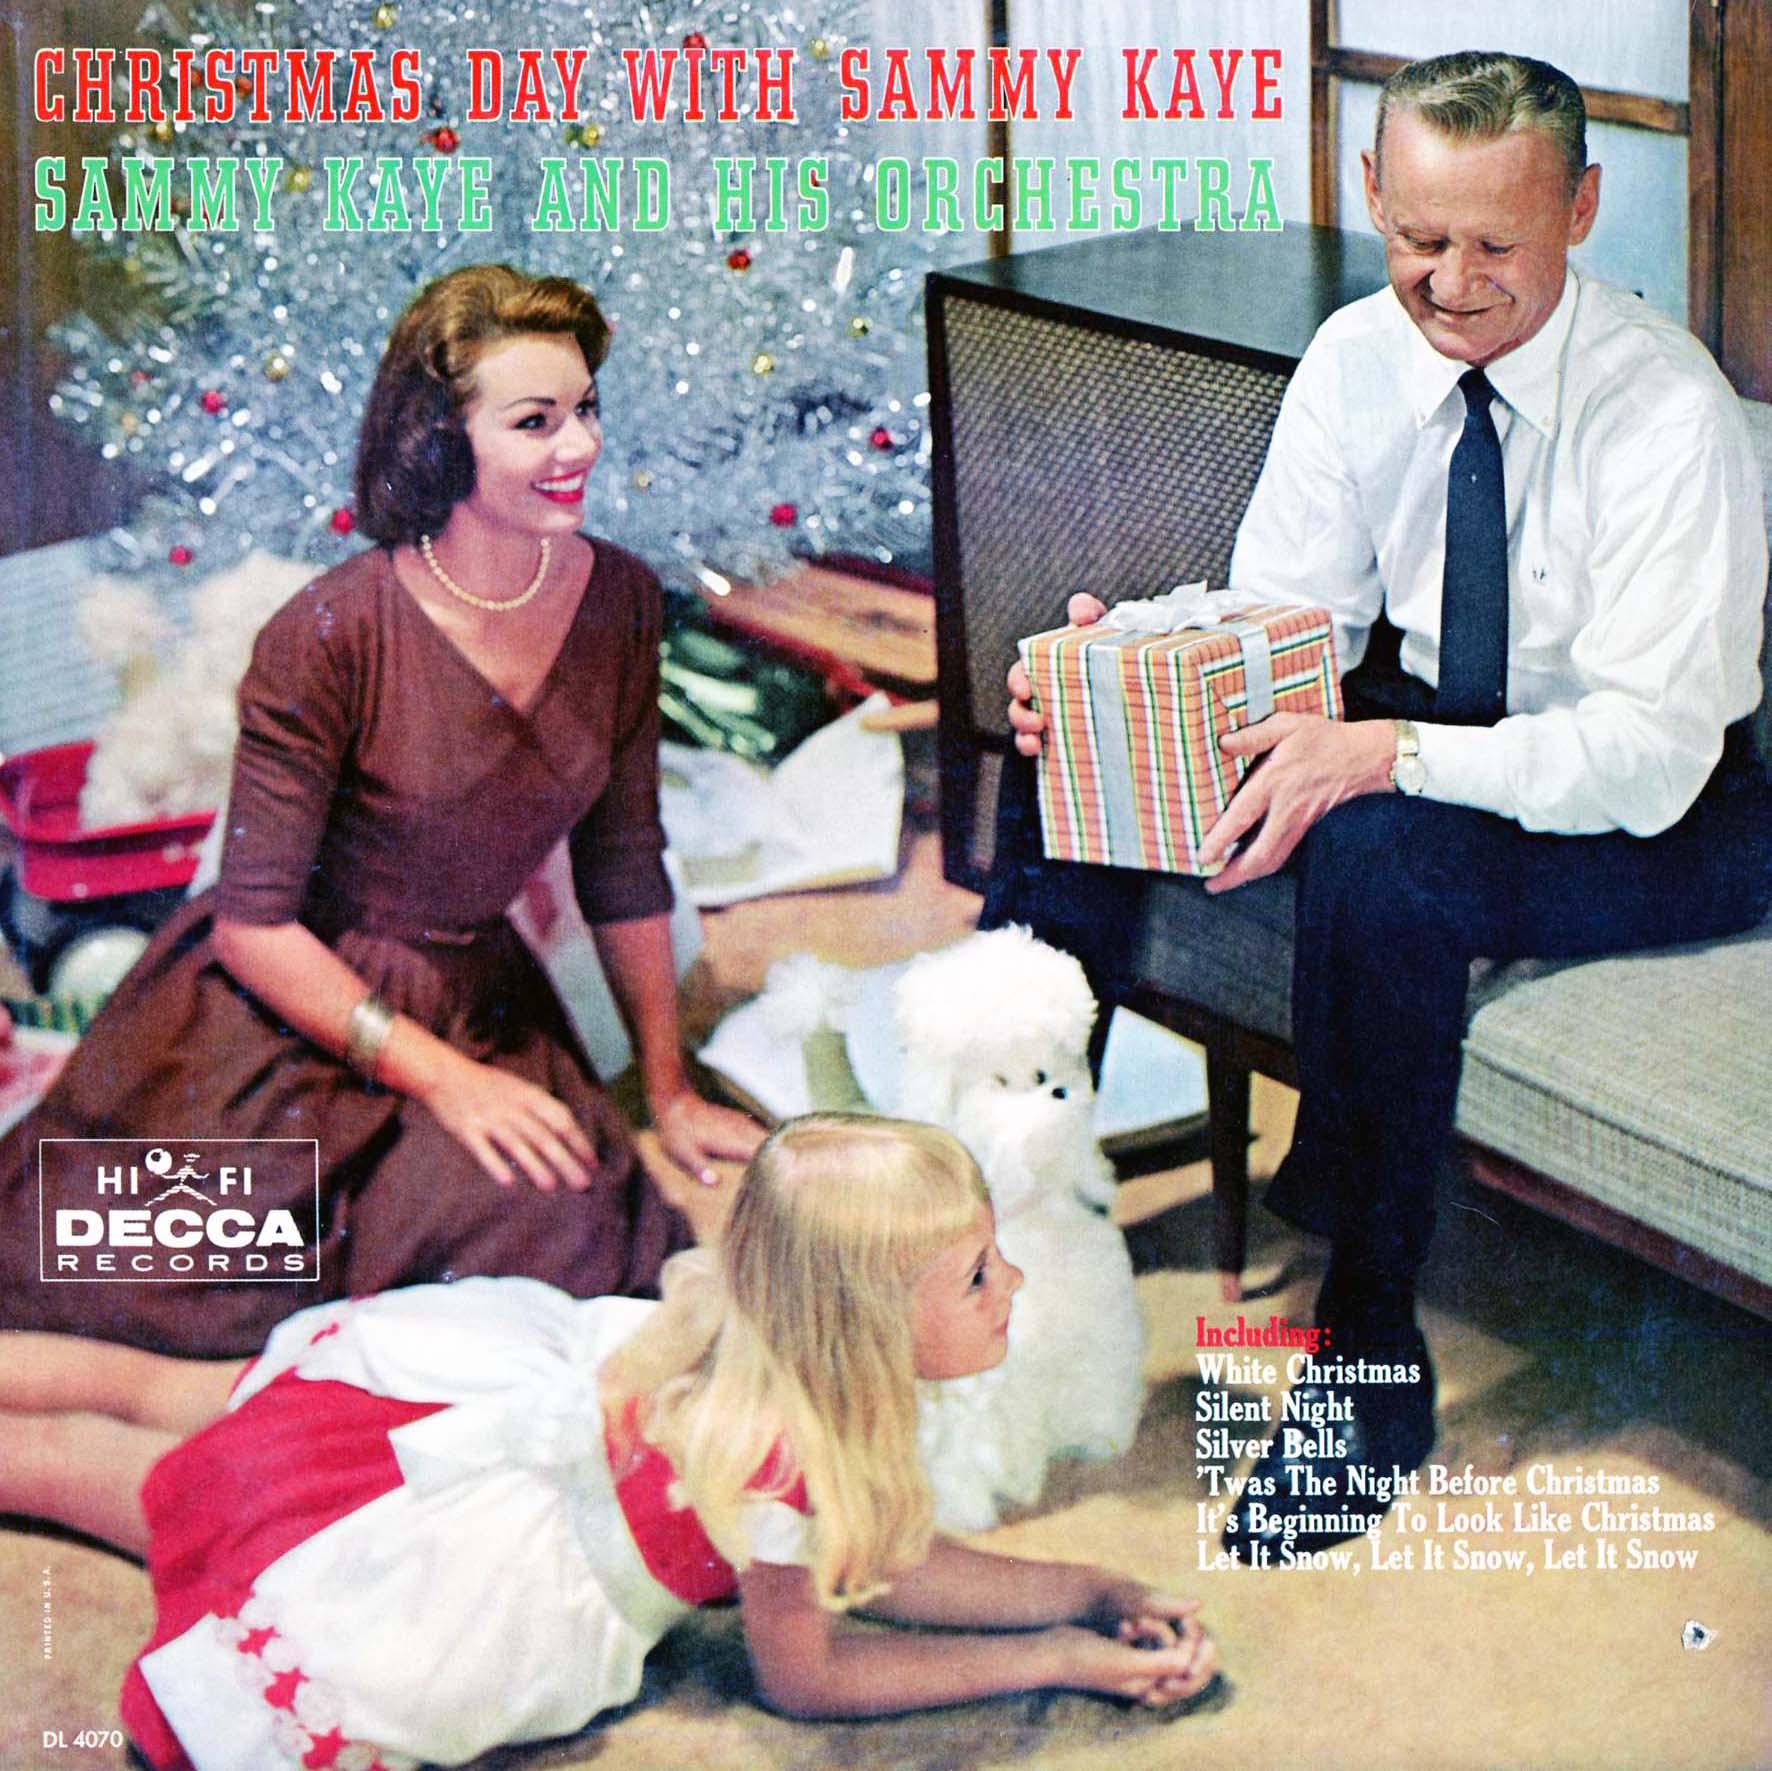 Sammy Kaye Come Dance With Me